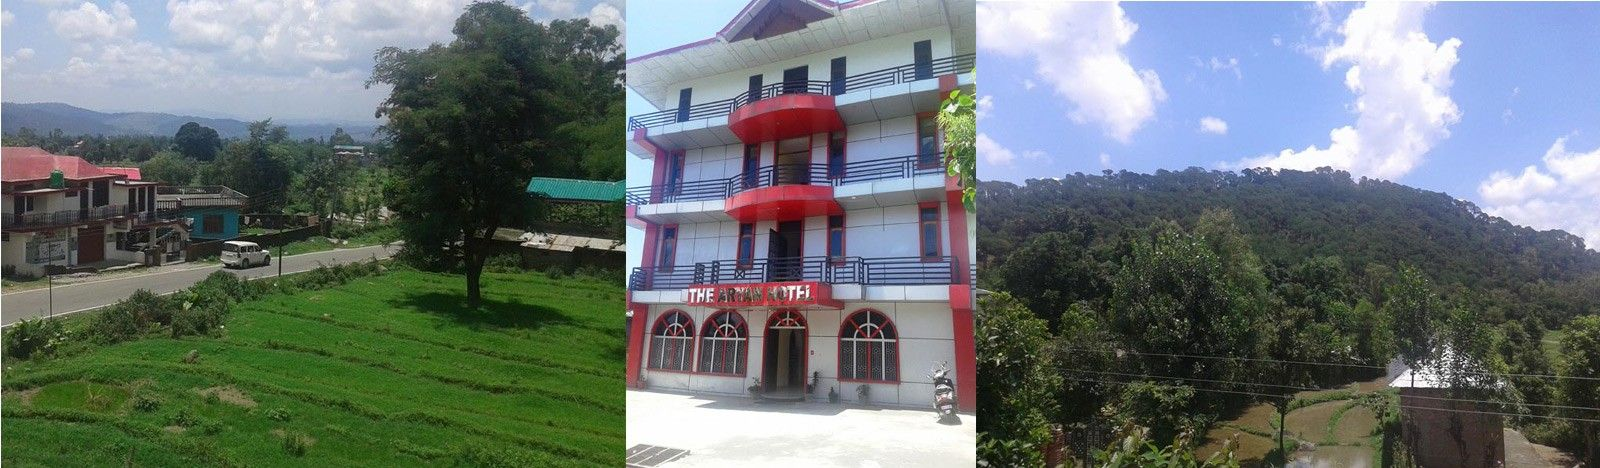 siddhi yoga dharamsala aryan hotel